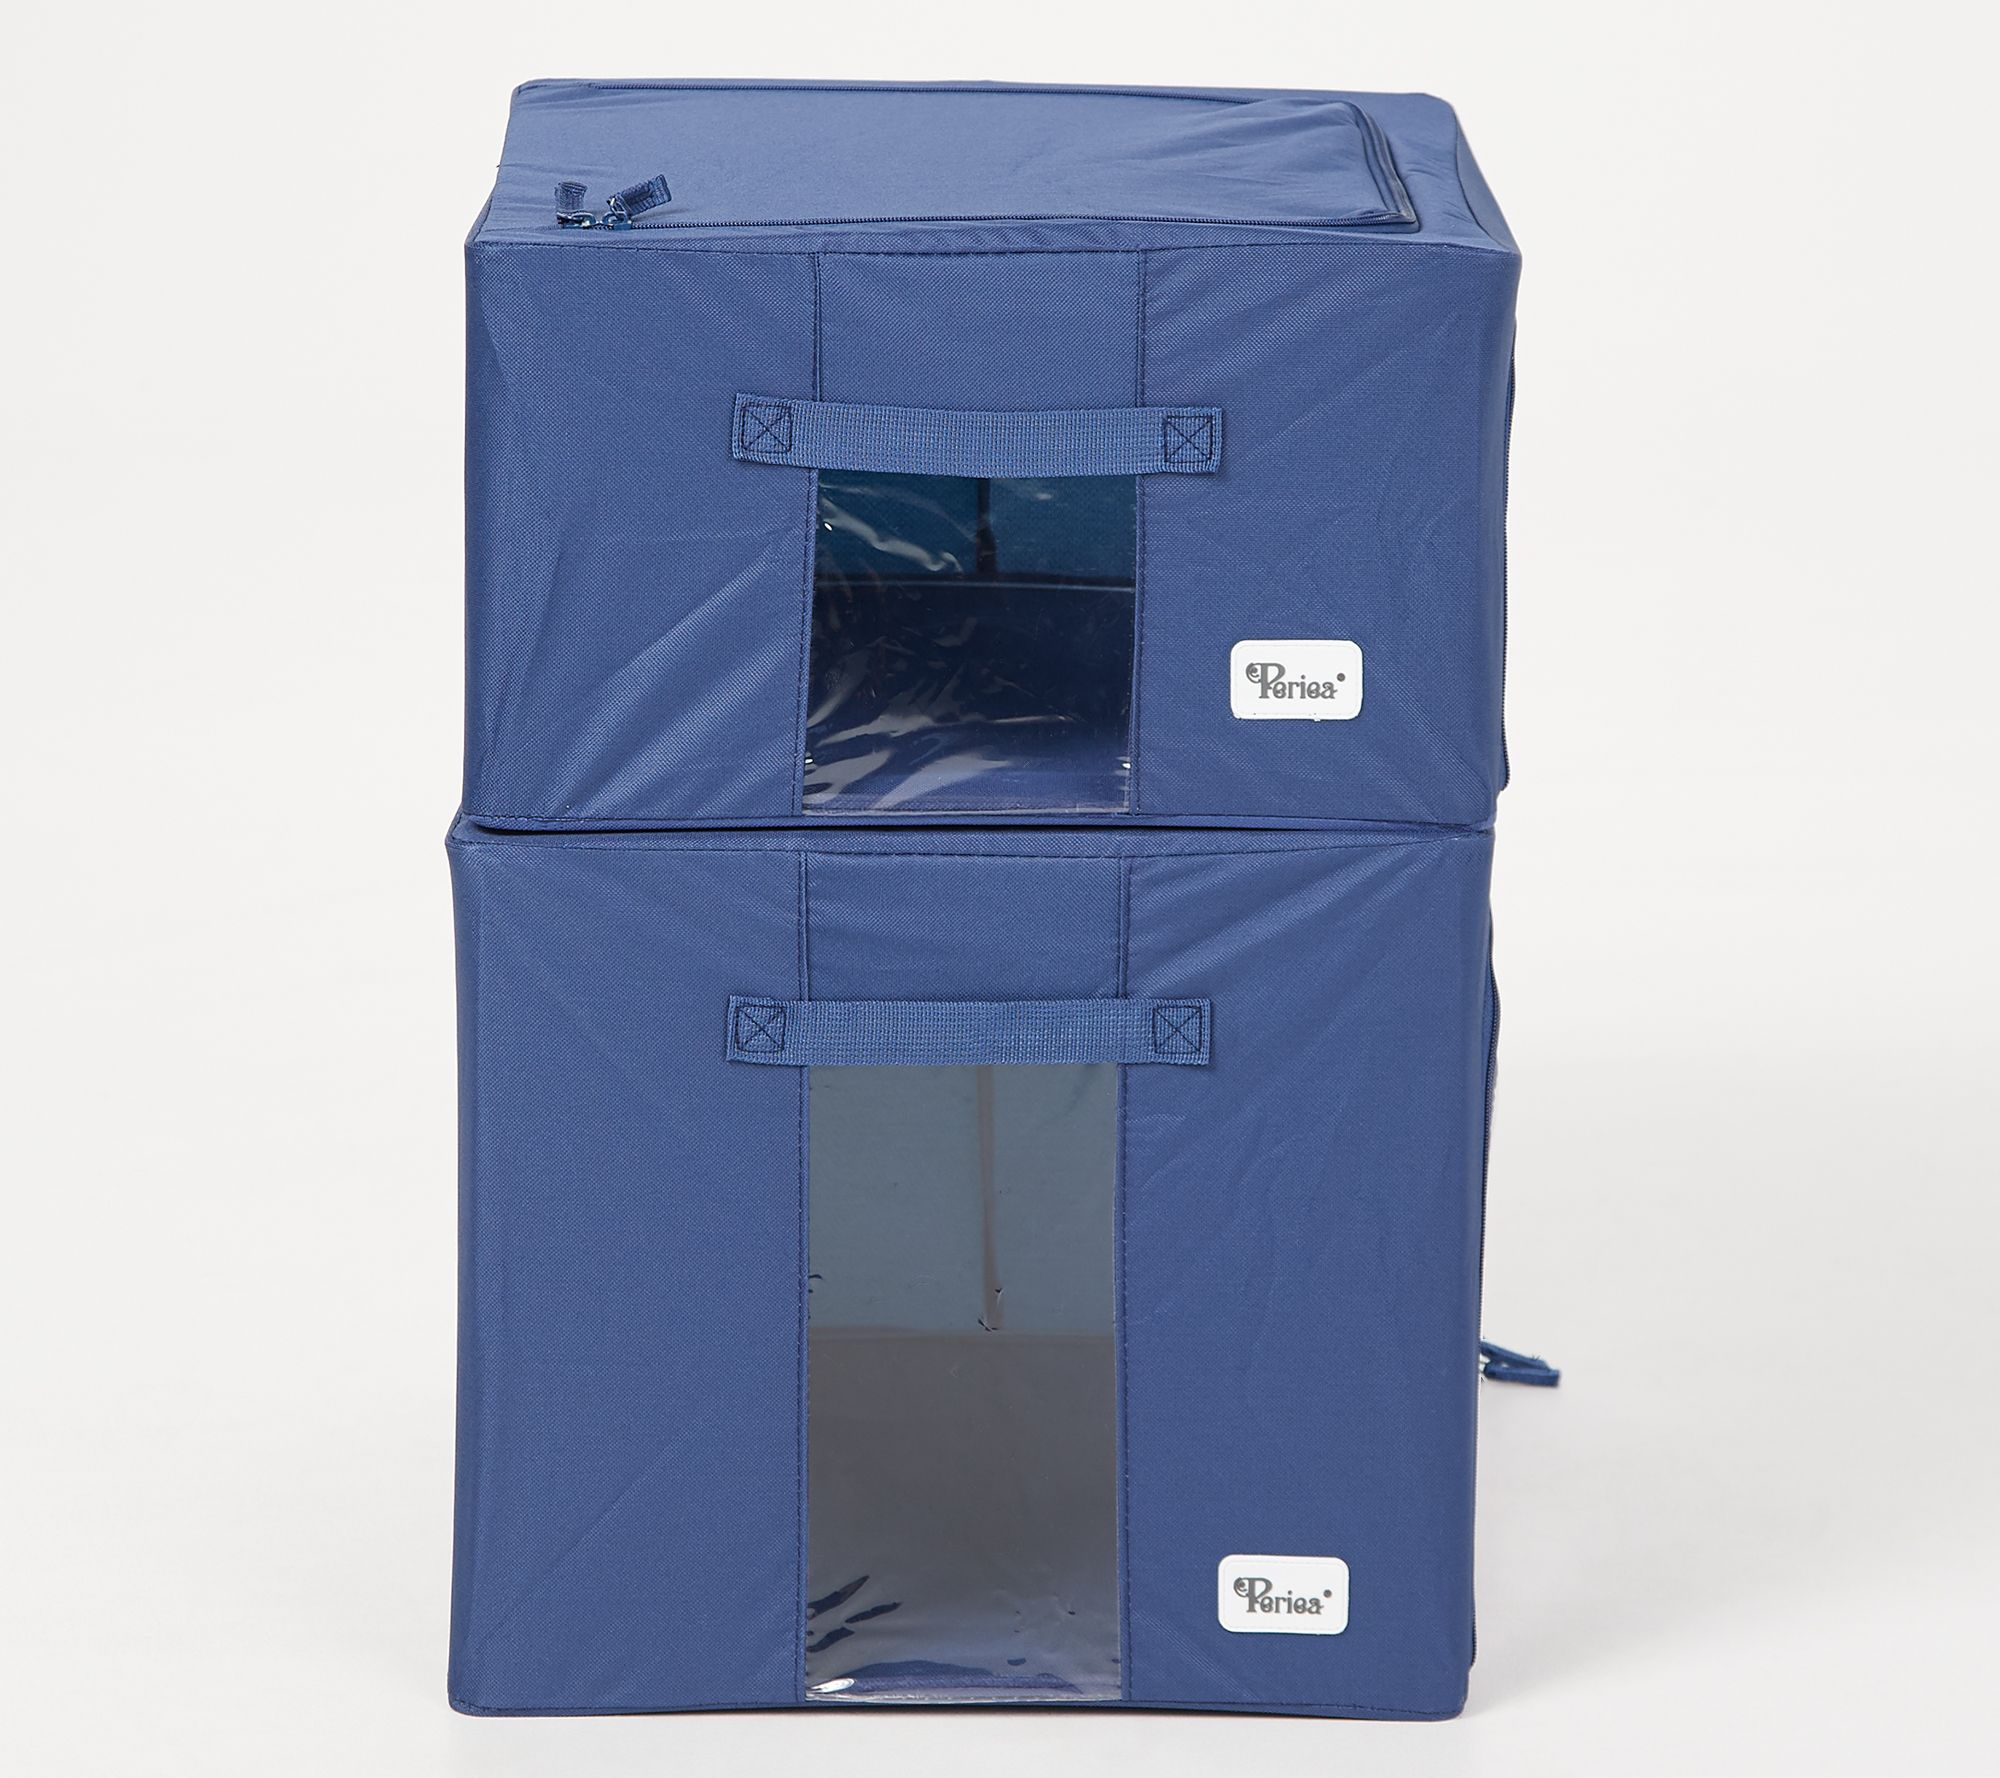 Periea Set Of 4 Collapsible Storage Boxes (2) Large U0026 (2) Medium Boxes    Page 1 U2014 QVC.com